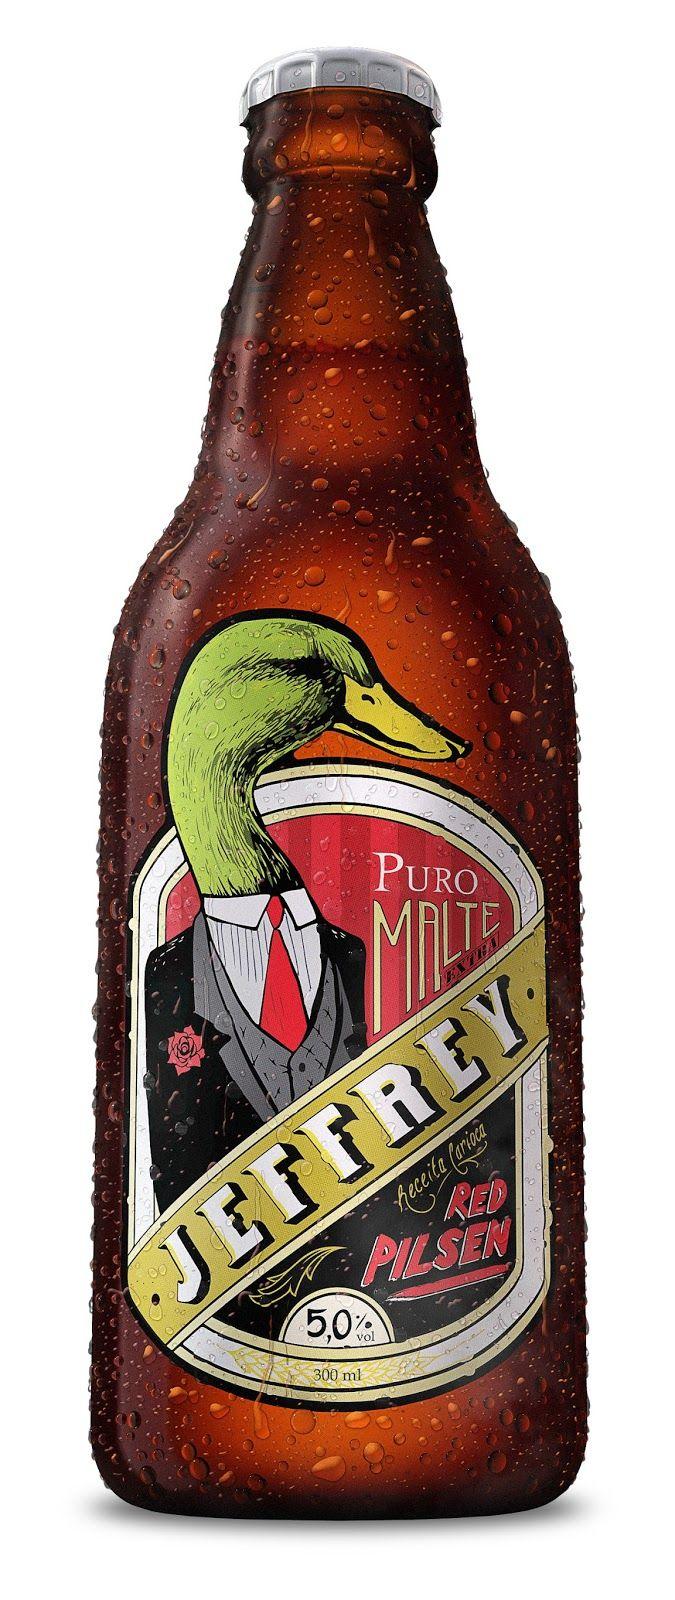 Guia do Mondial de la Bière 2015 | Maria Cevada | Blog de Cerveja Artesanal